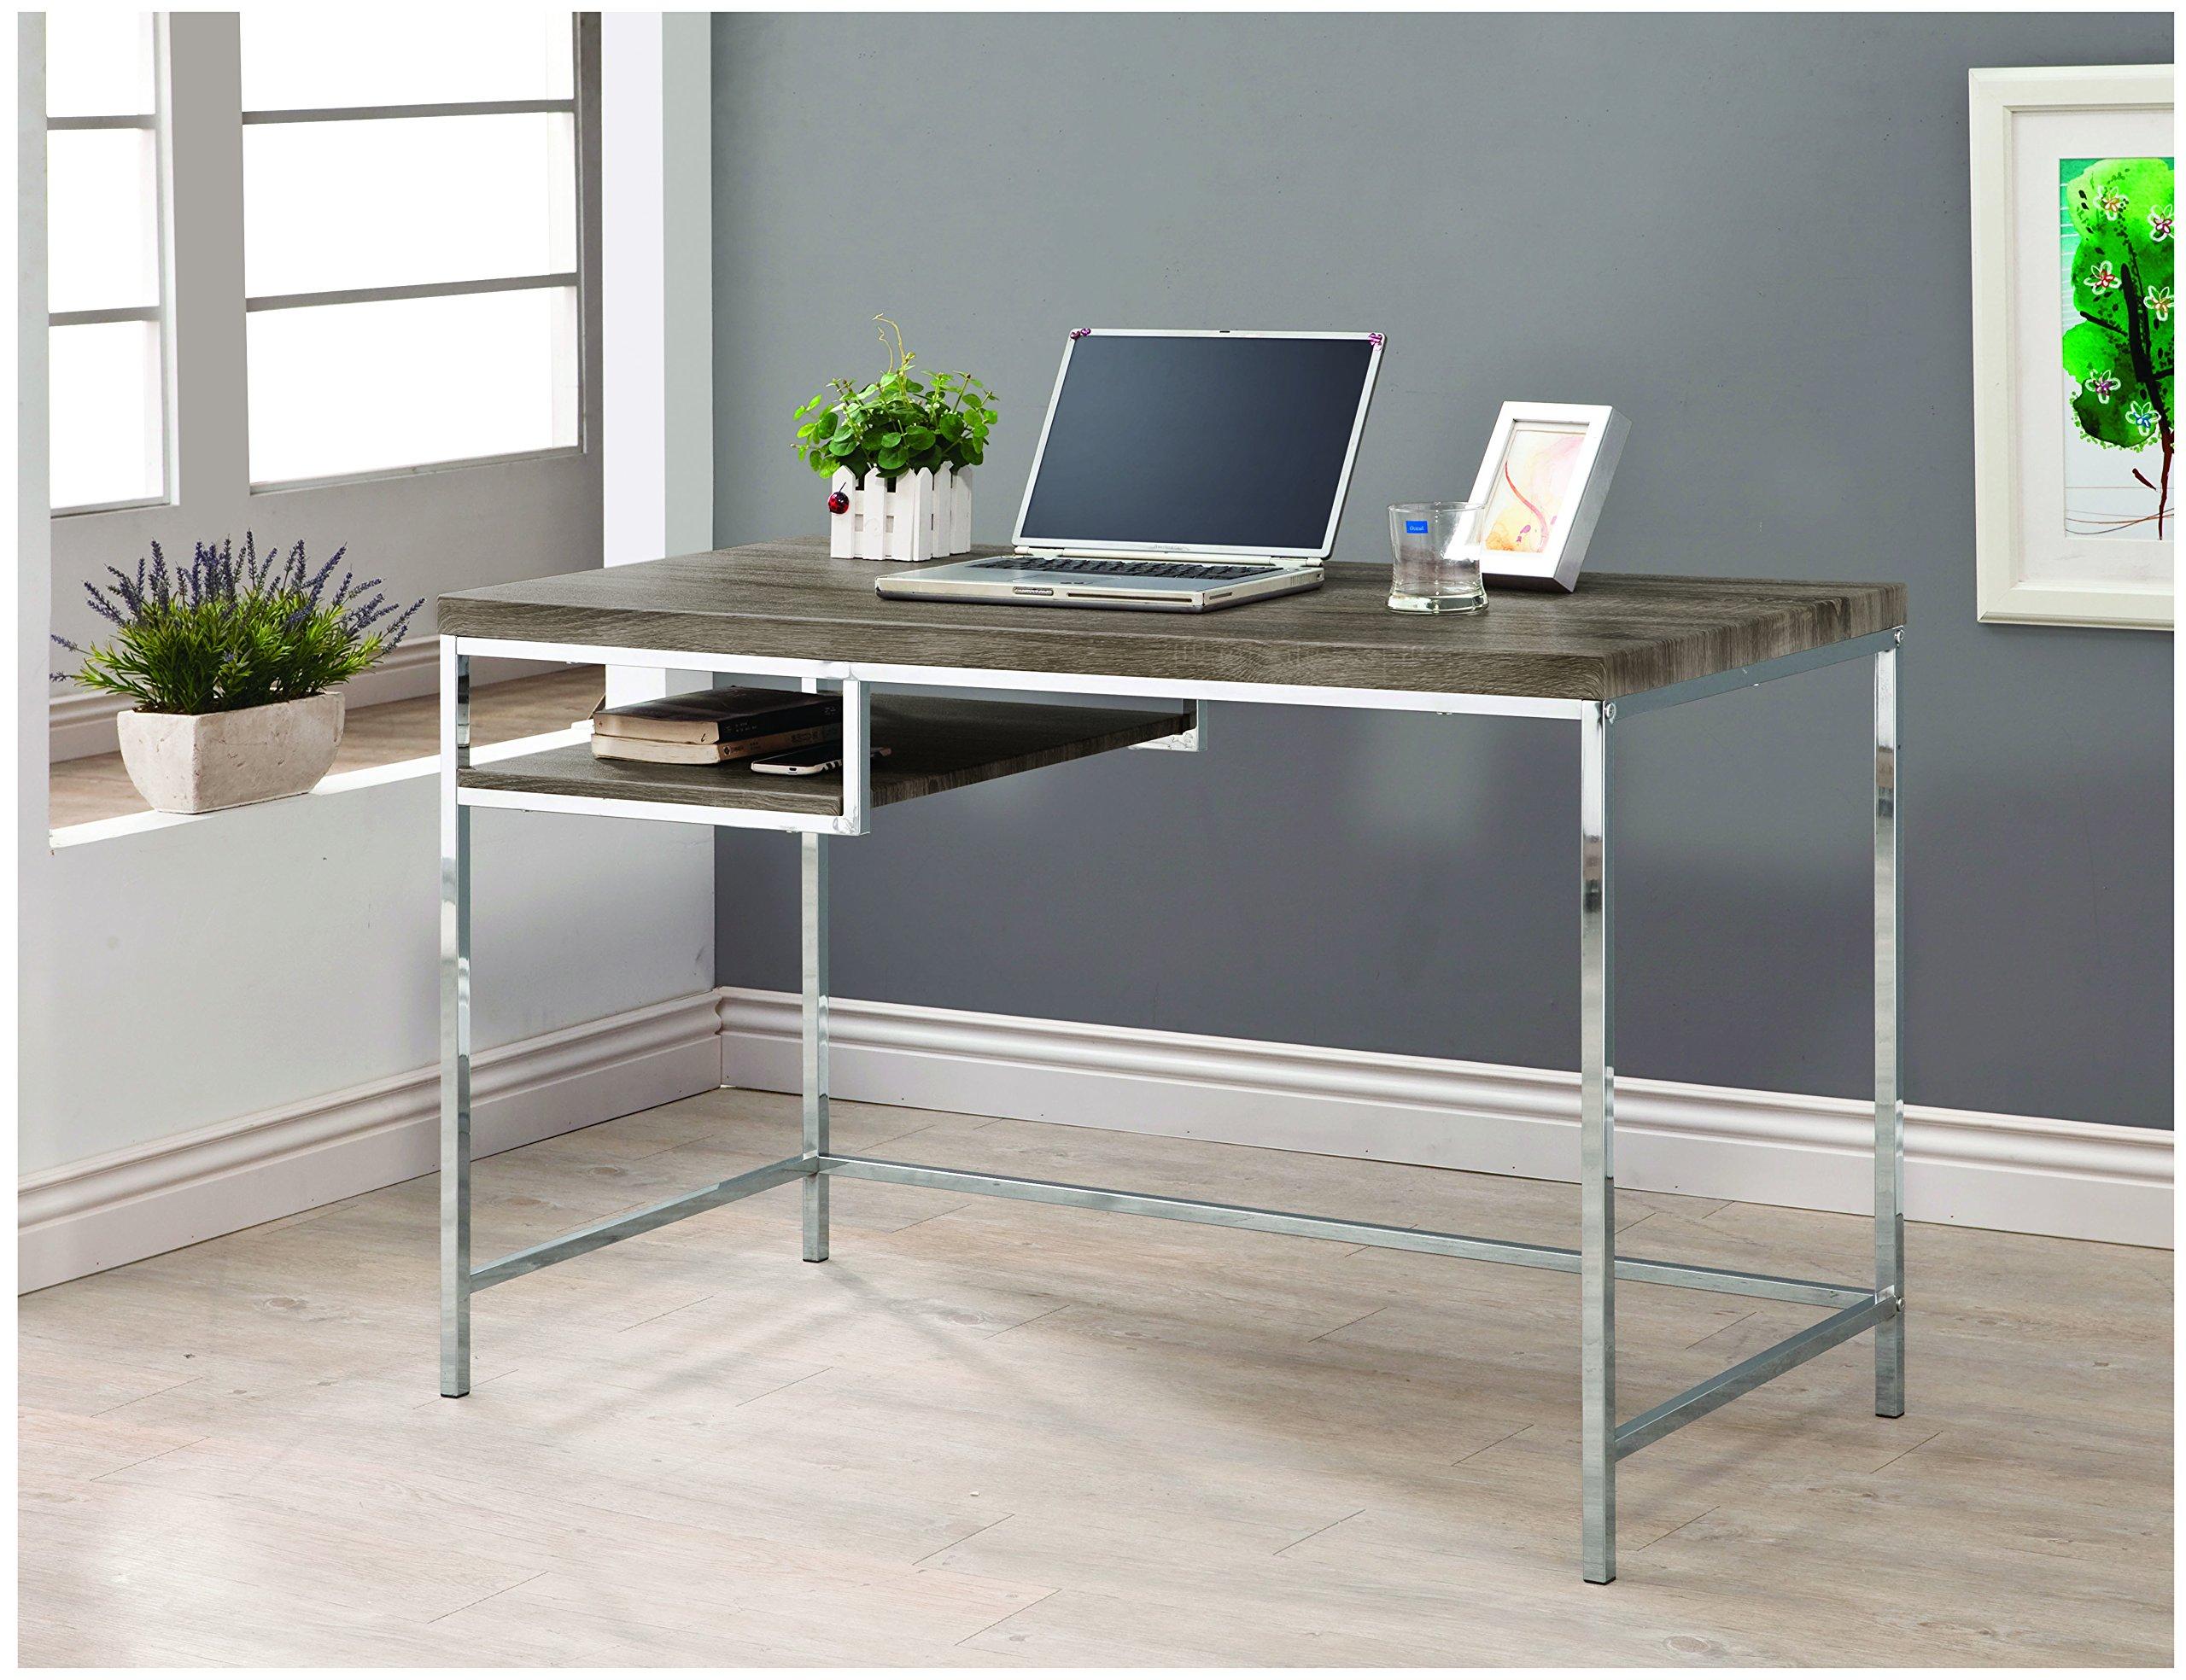 Coaster 801271 Home Furnishings Desk, Weathered Grey